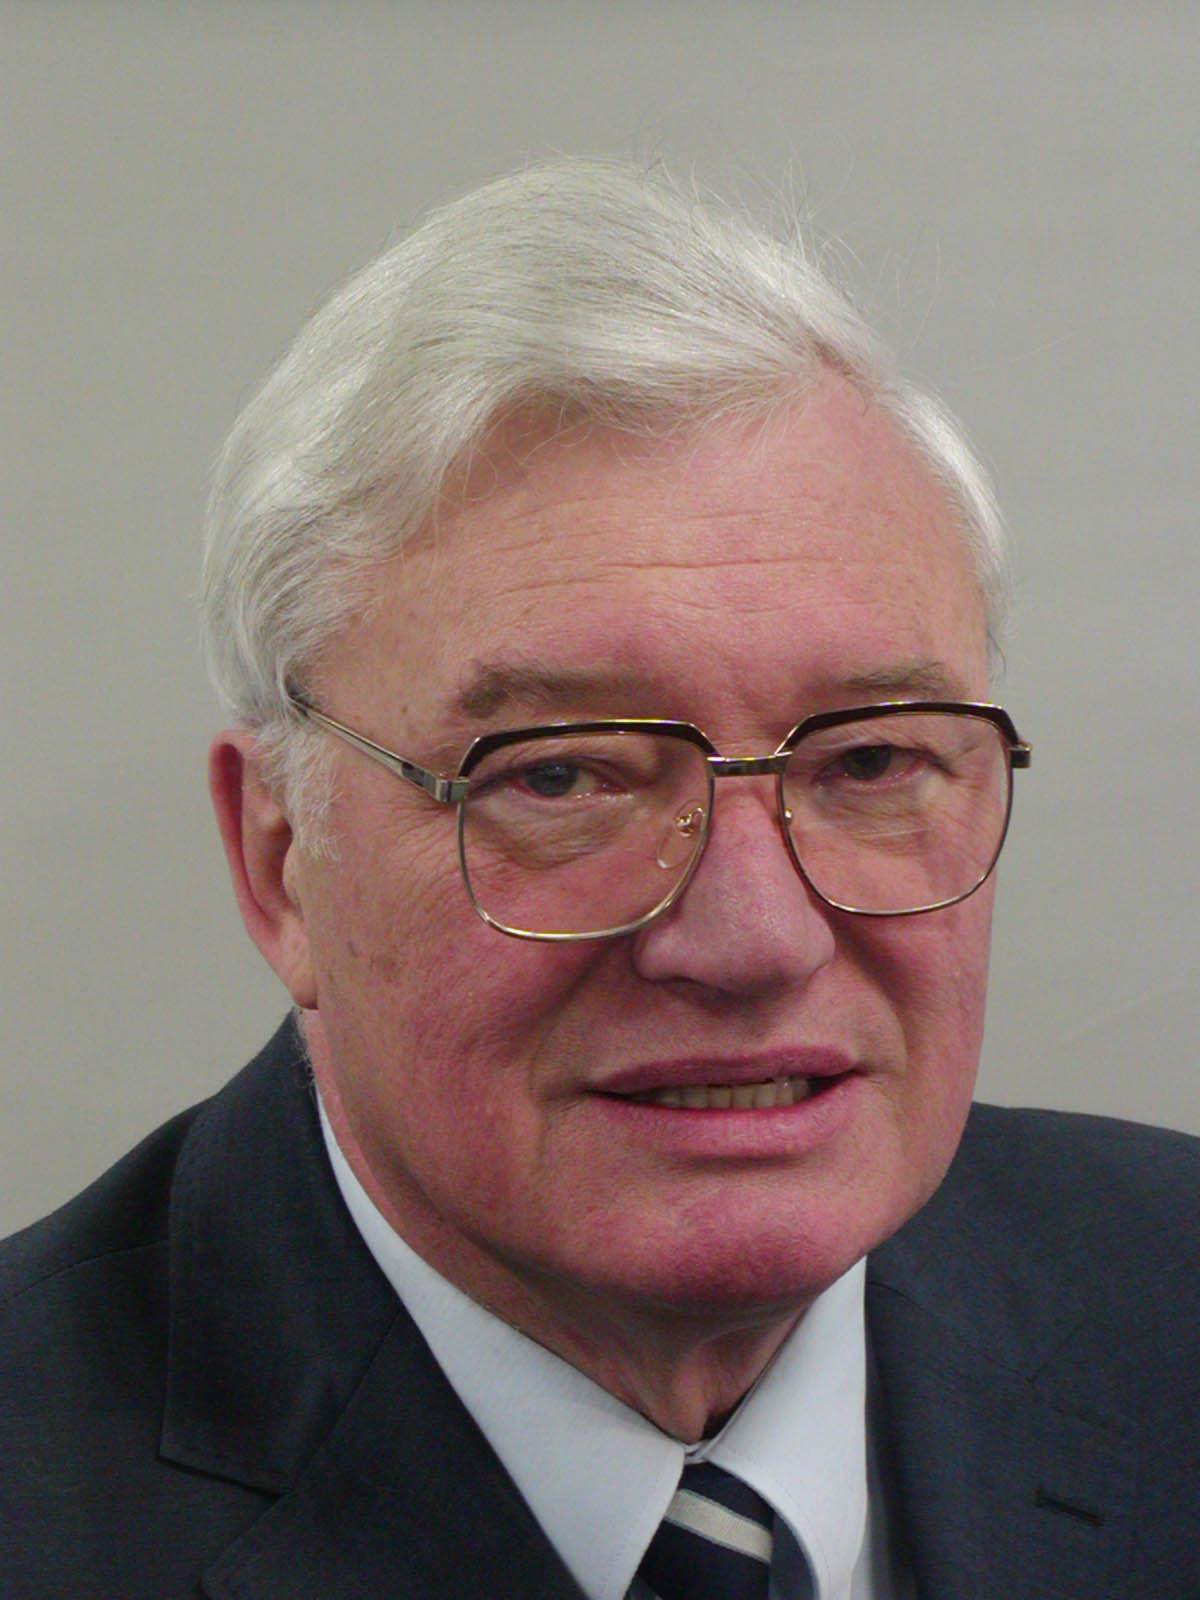 Lebenslauf - Schwob, Anton, Em.Univ.-Prof. Dr.